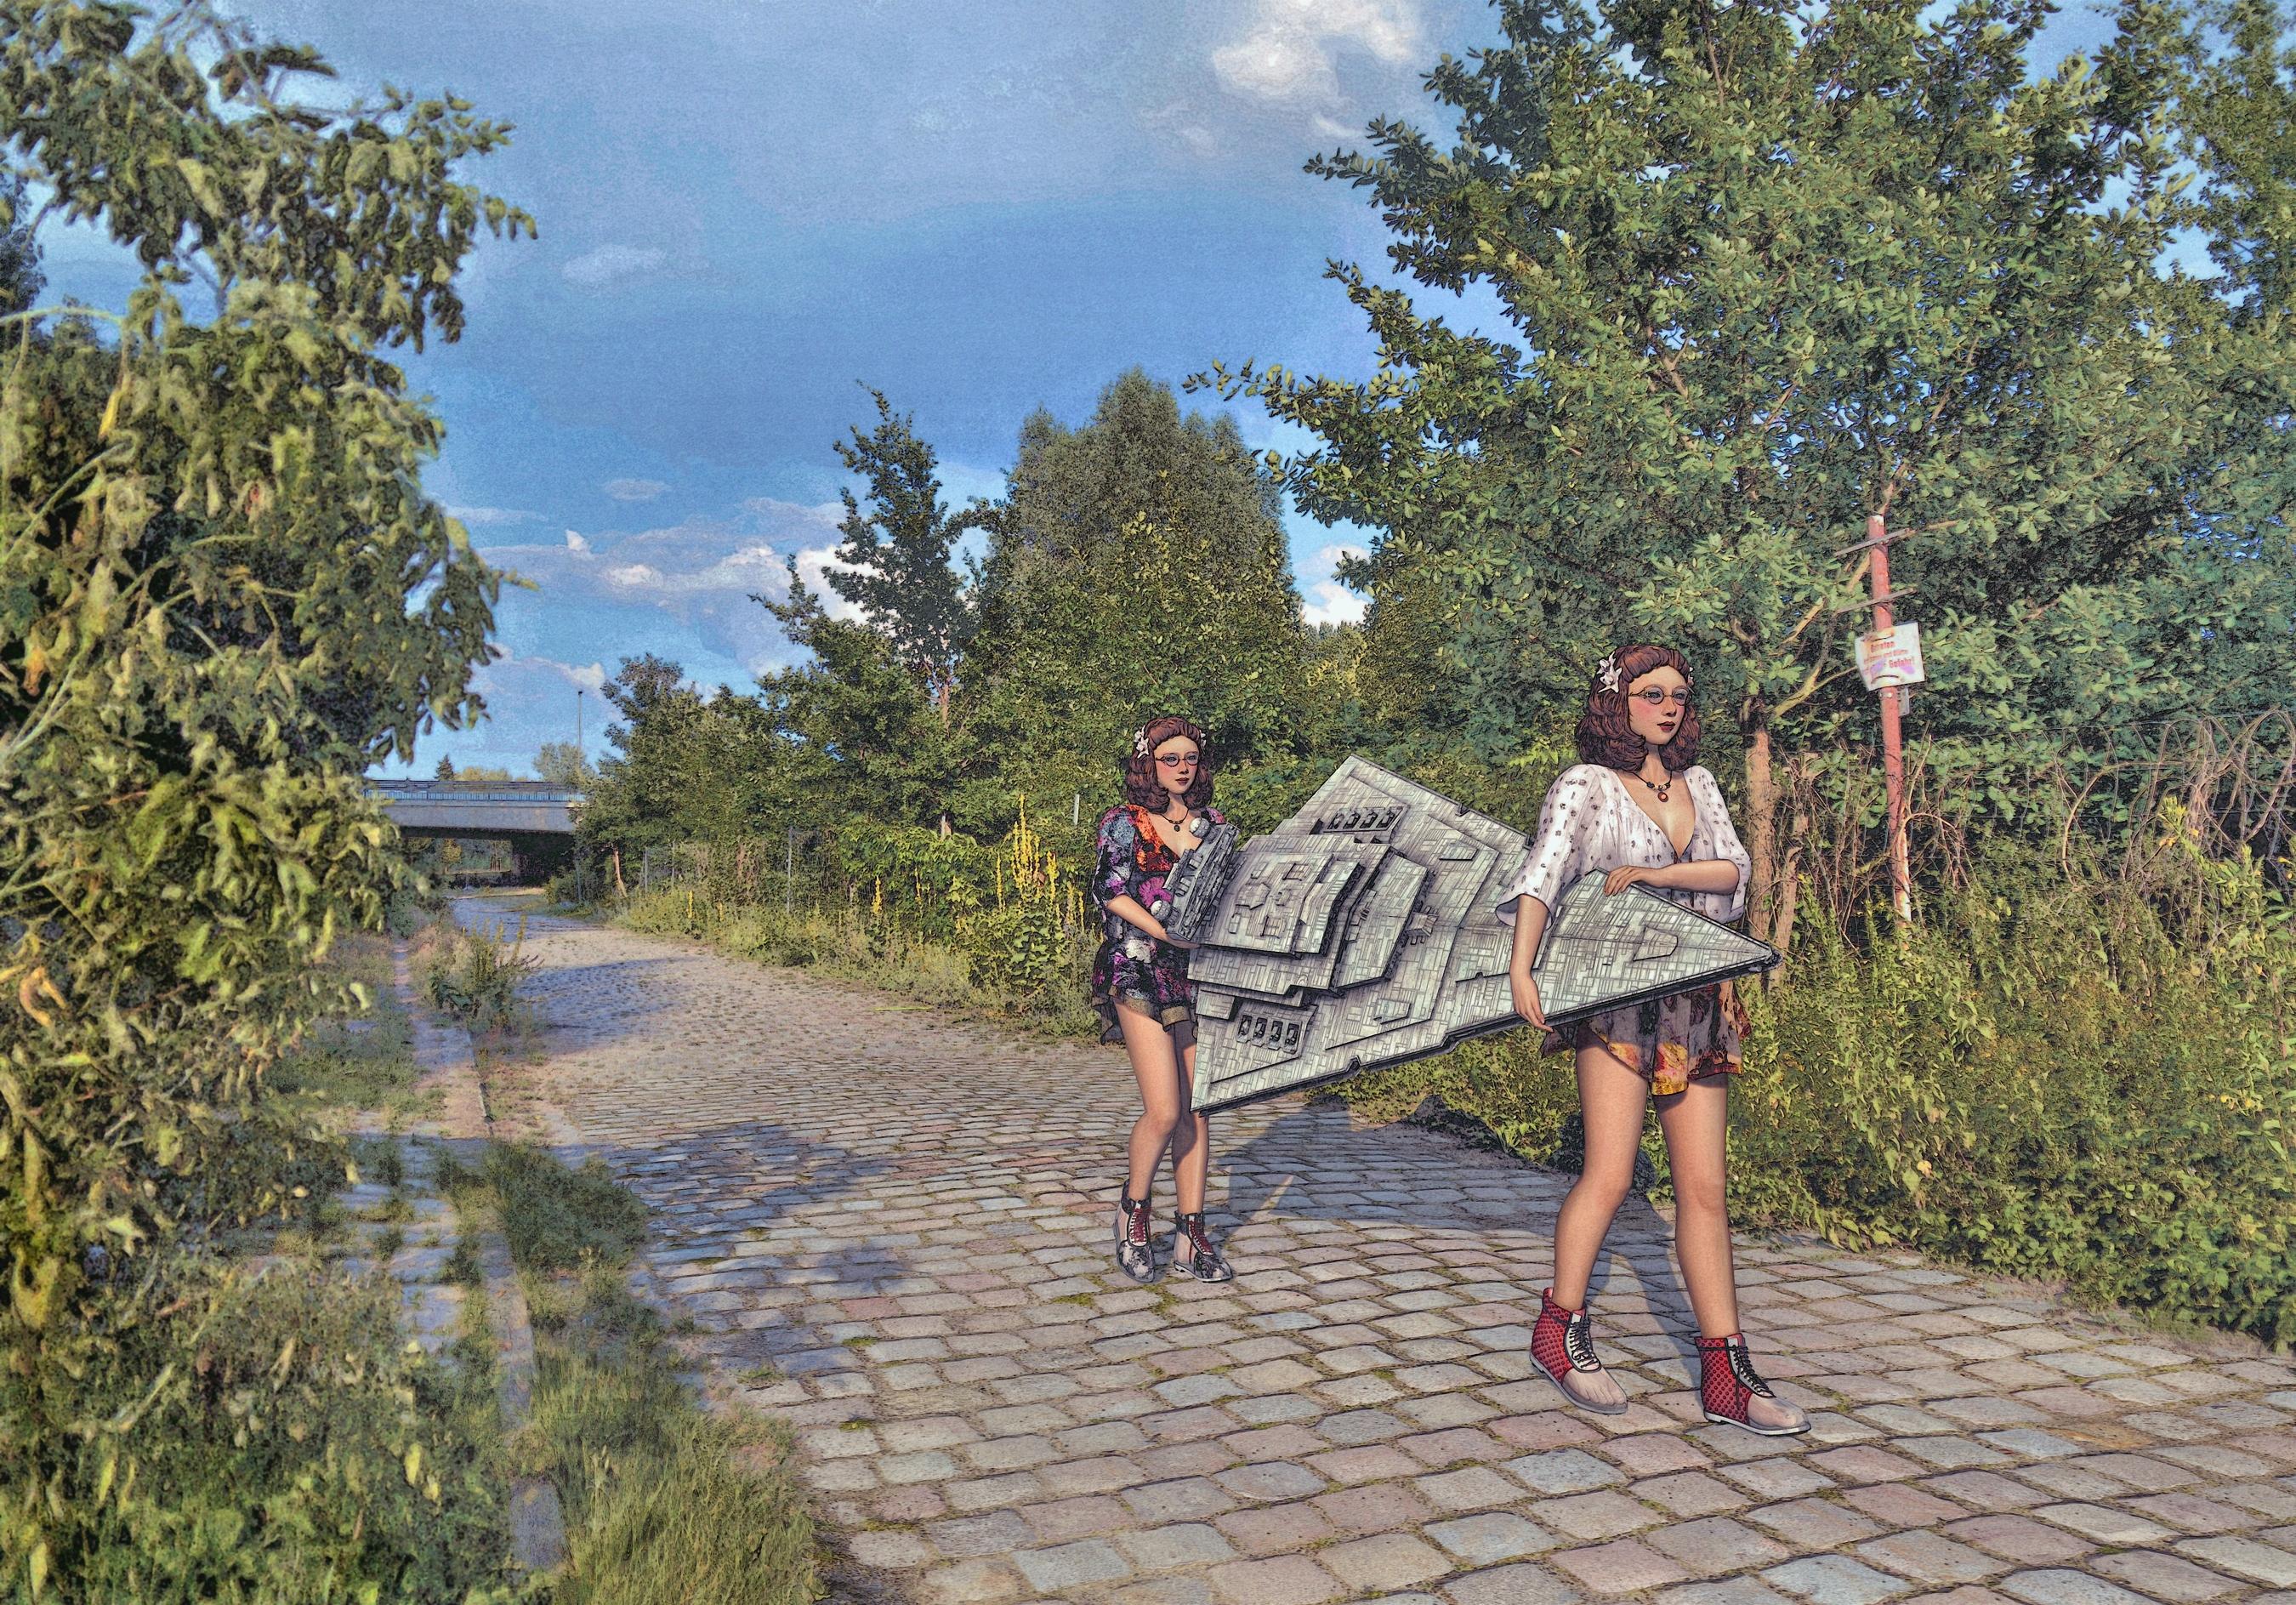 Berlin-Charlottenburg-Nord, Park am Schleusenkanal, Blick zum Tegeler Weg